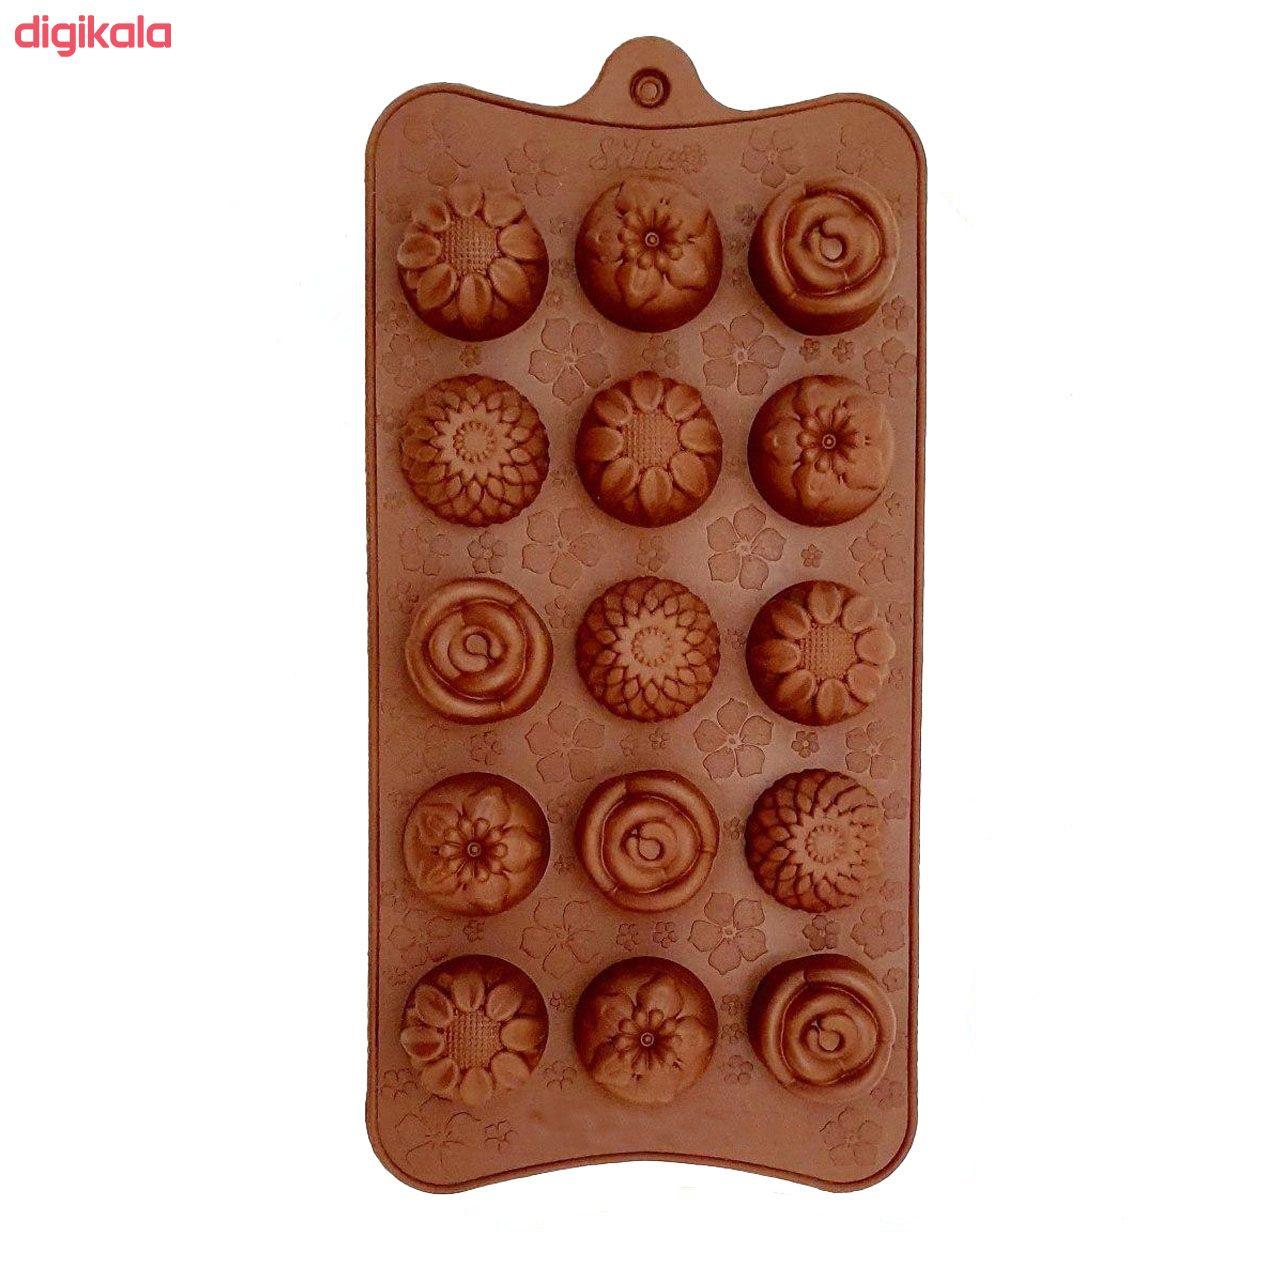 قالب شکلات کد 66 main 1 1